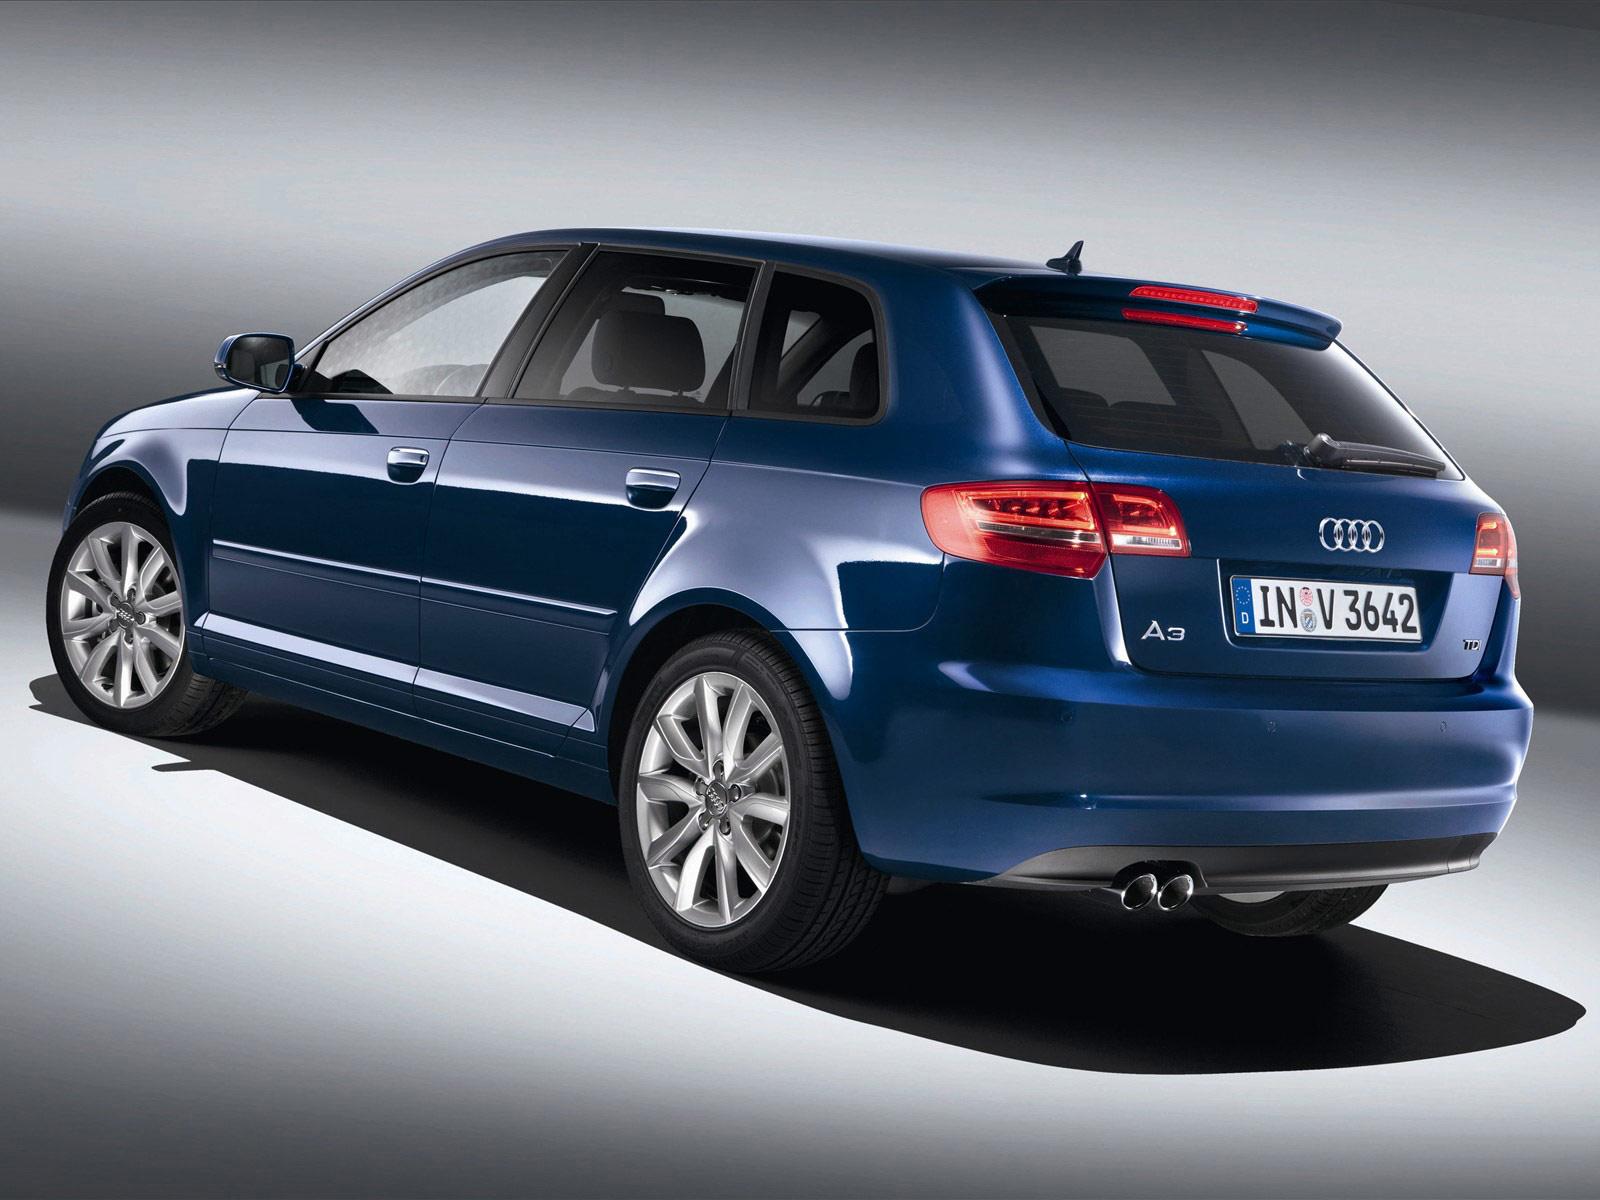 http://2.bp.blogspot.com/_m_XWwB73yT4/TIQVMpKJSsI/AAAAAAAACMQ/N2vPDQGz3Rc/s1600/Audi_A3-Sportback_2011_car_pictures3.jpg